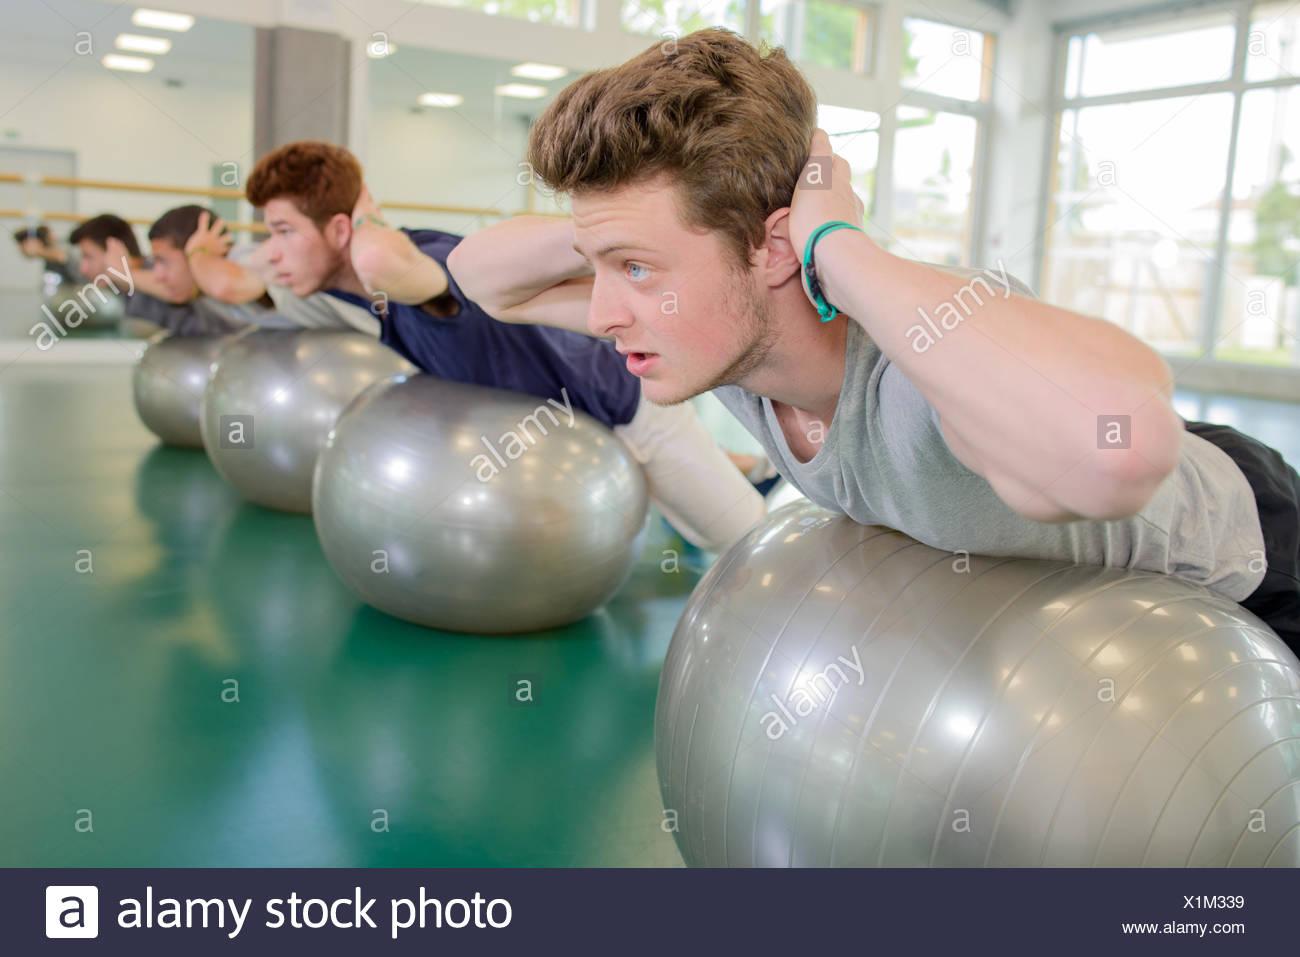 men on their gym ball - Stock Image